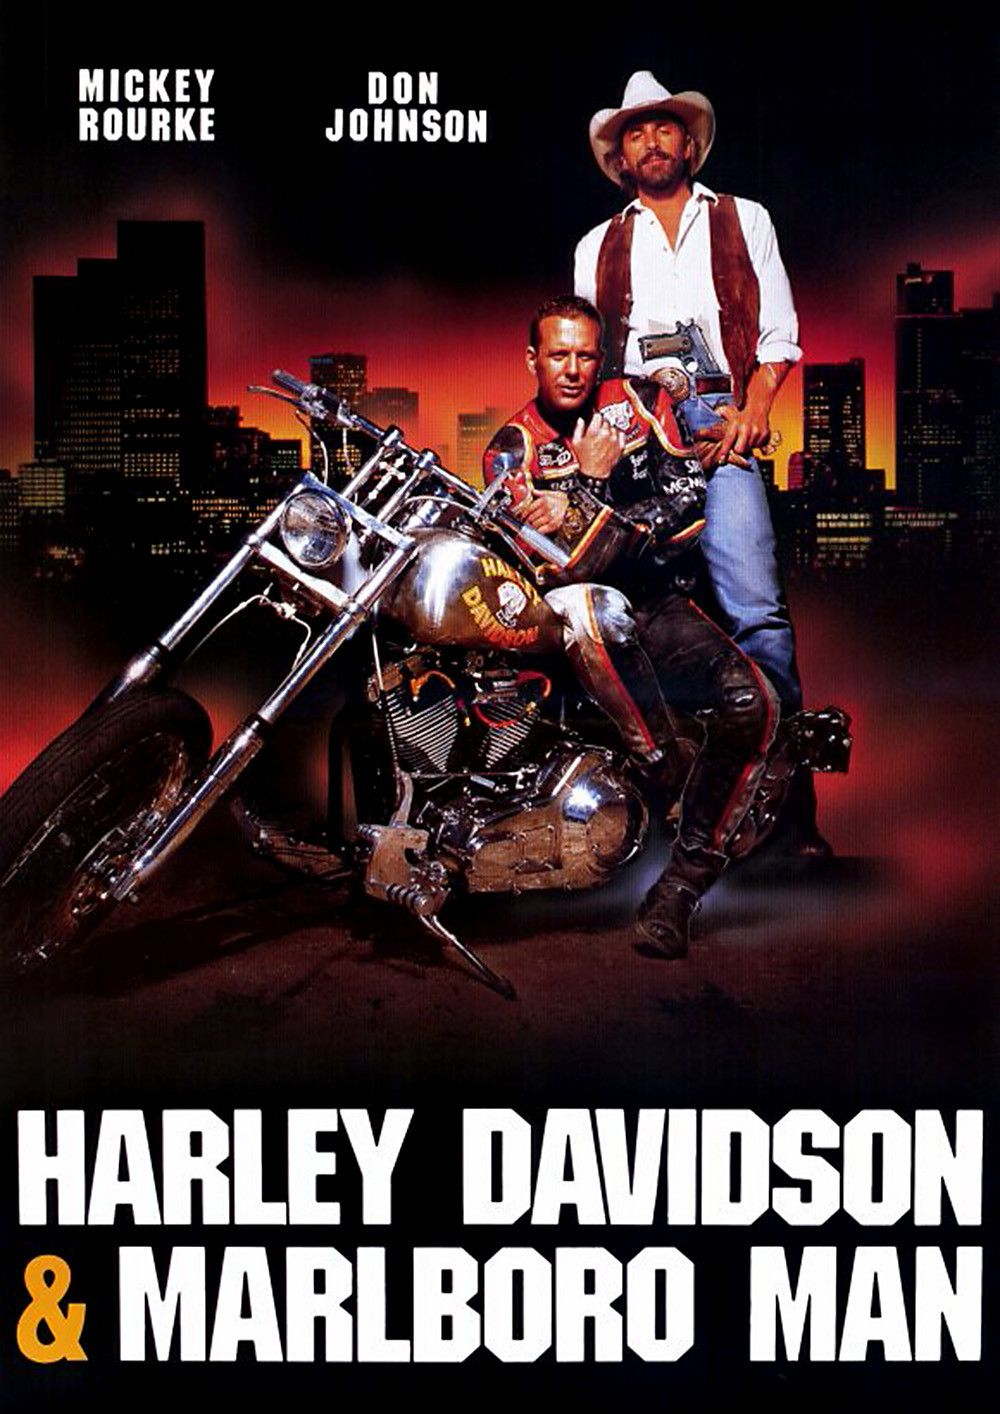 Harley Davidson The Marlboro Man Hd Mm Harley Davidson